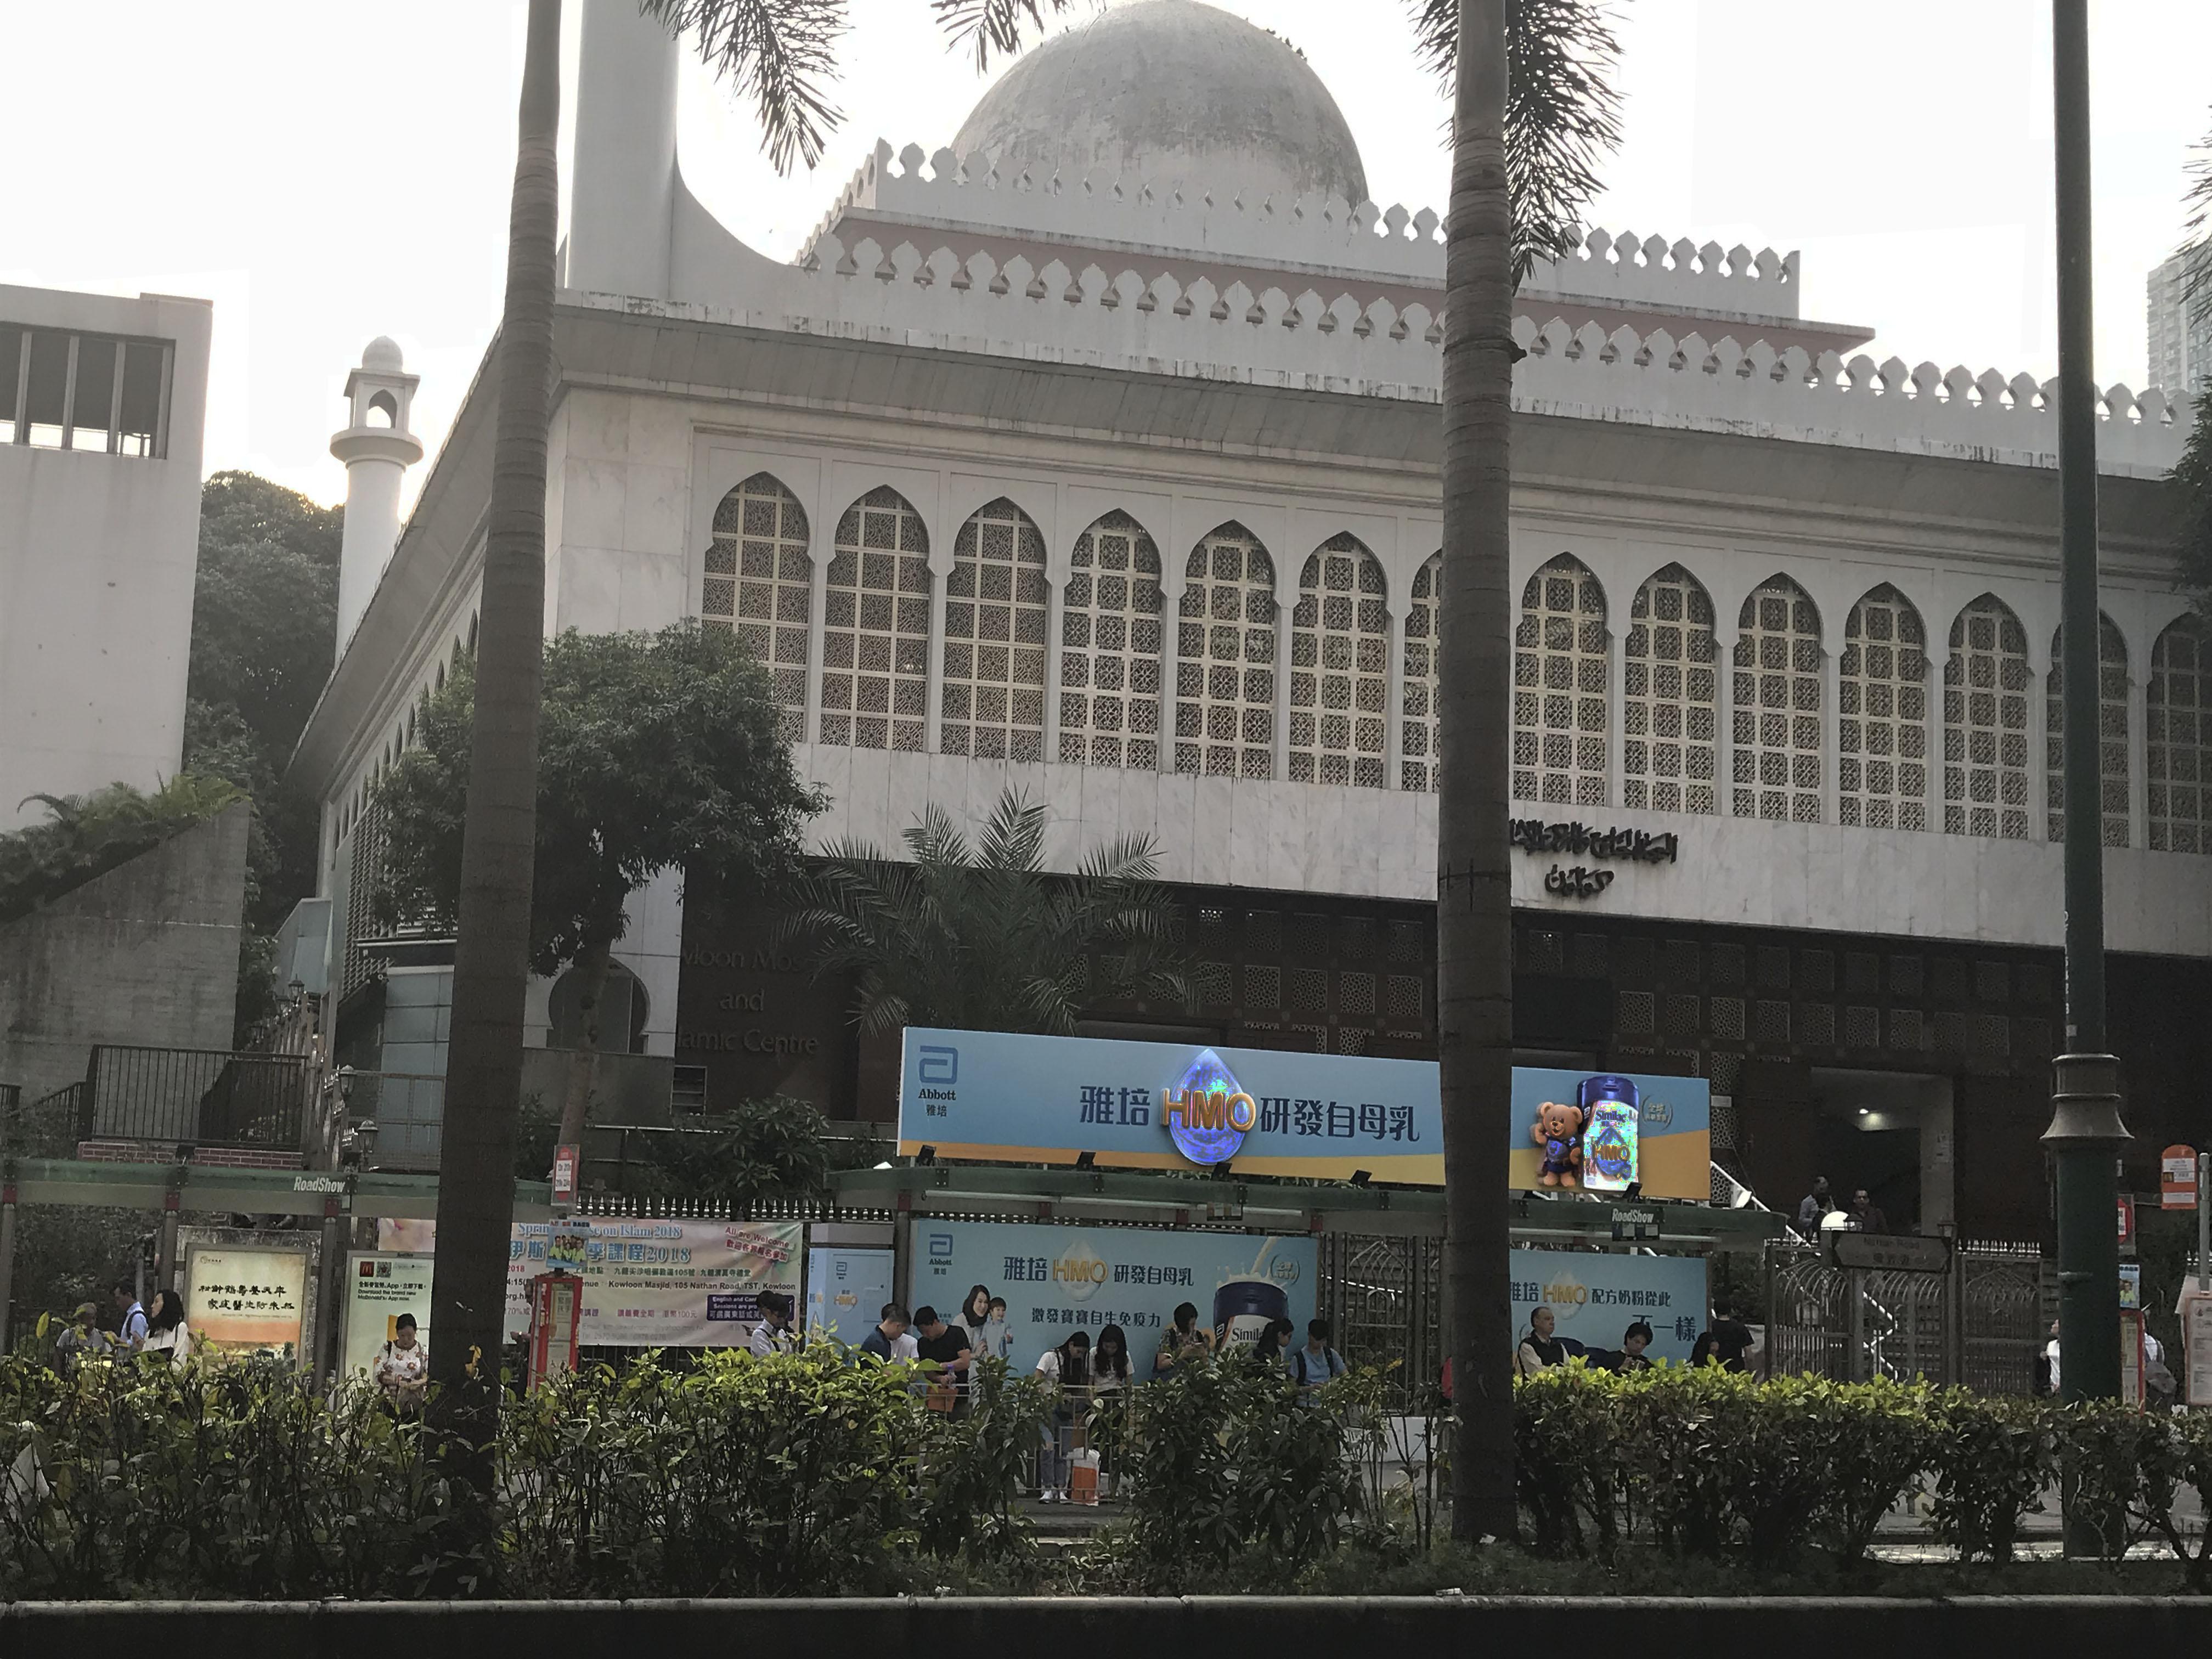 Tsim Sha Tsui Mosque 尖沙咀清真寺